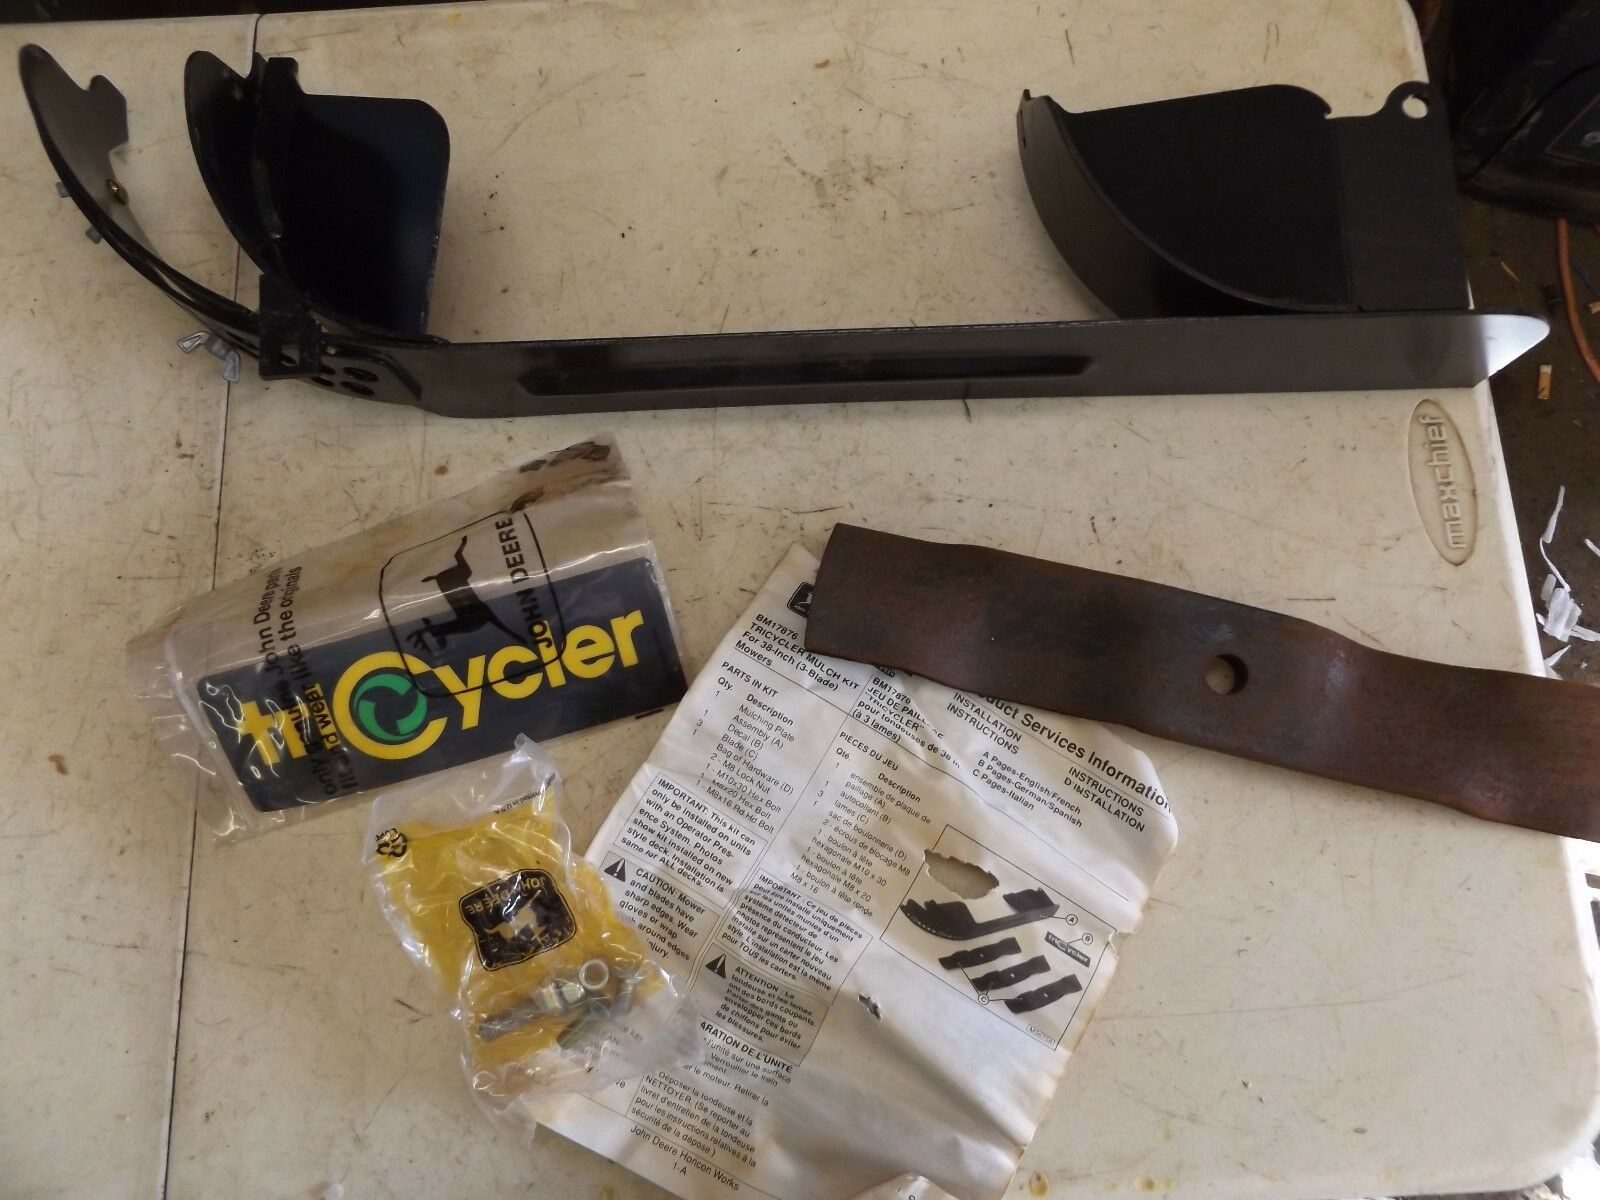 John Deere tricycler mantillo Kit BM 17876 38  3  3 cortadoras de hoja